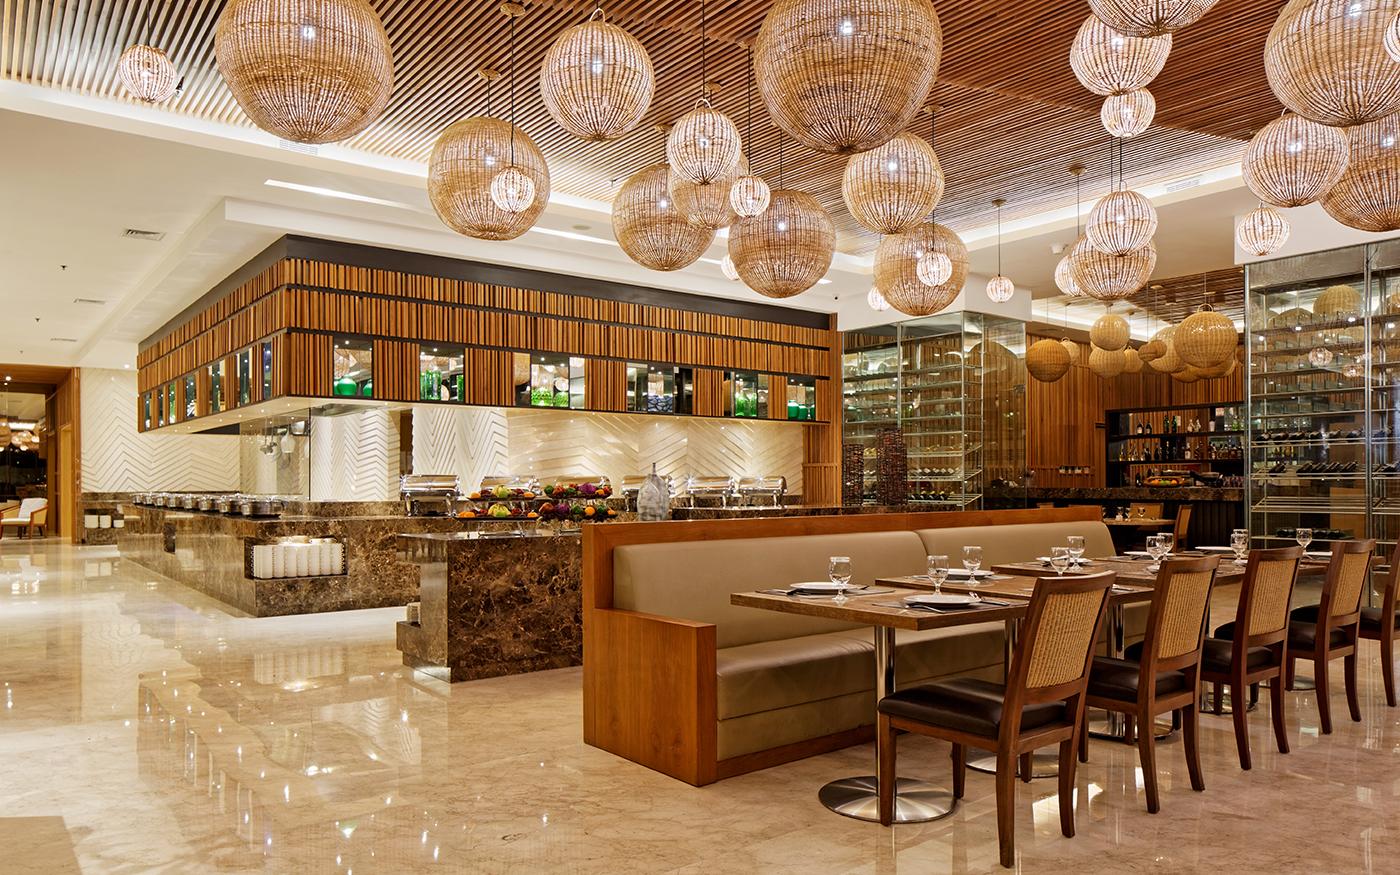 553-RINRA-Hotel-interior-(TSID)--07__09.11.2017-